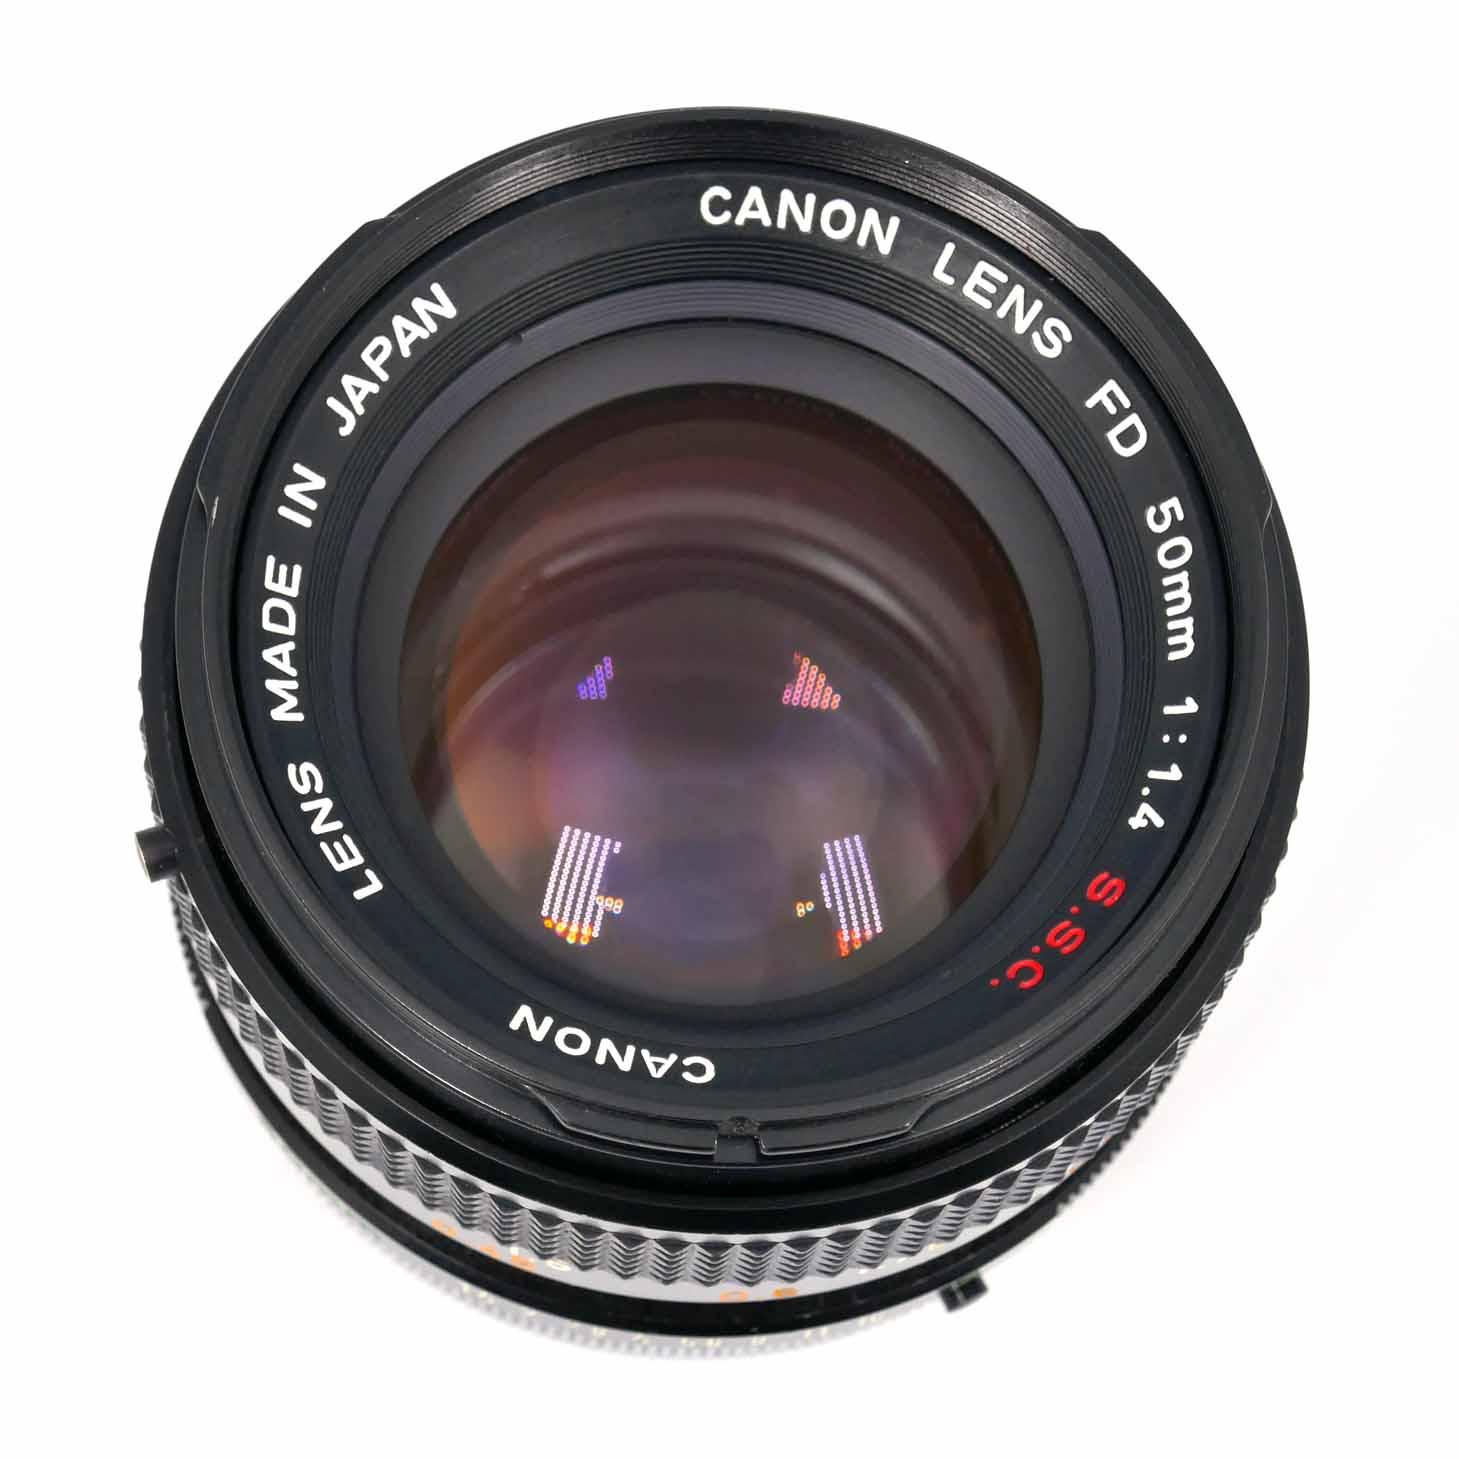 clean-cameras-Canon-FD-50mm-1.4-s.s.c-03